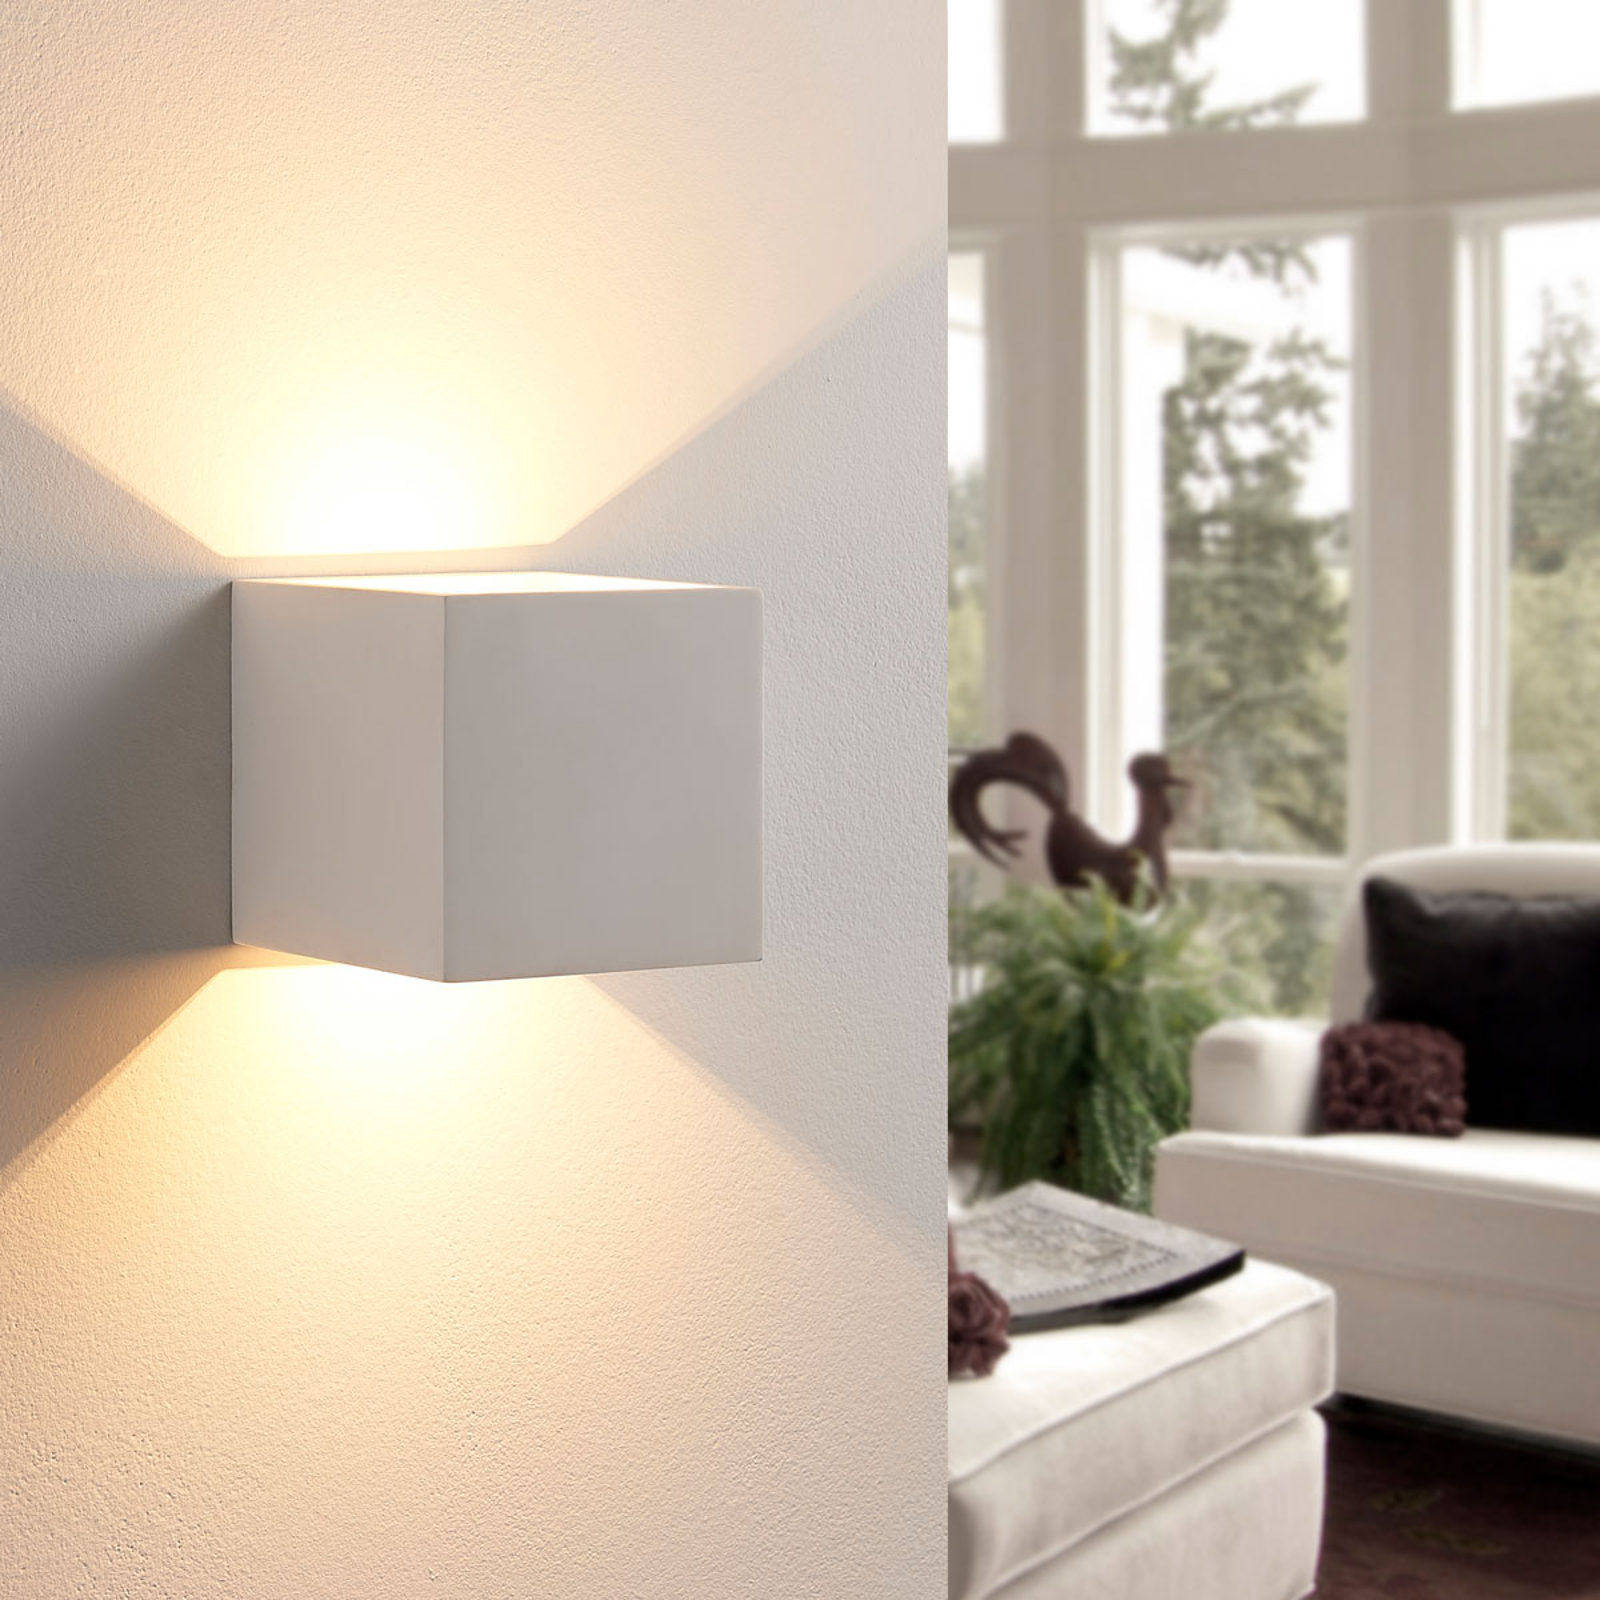 Würfelförmige LED-Wandlampe Kay aus Gips